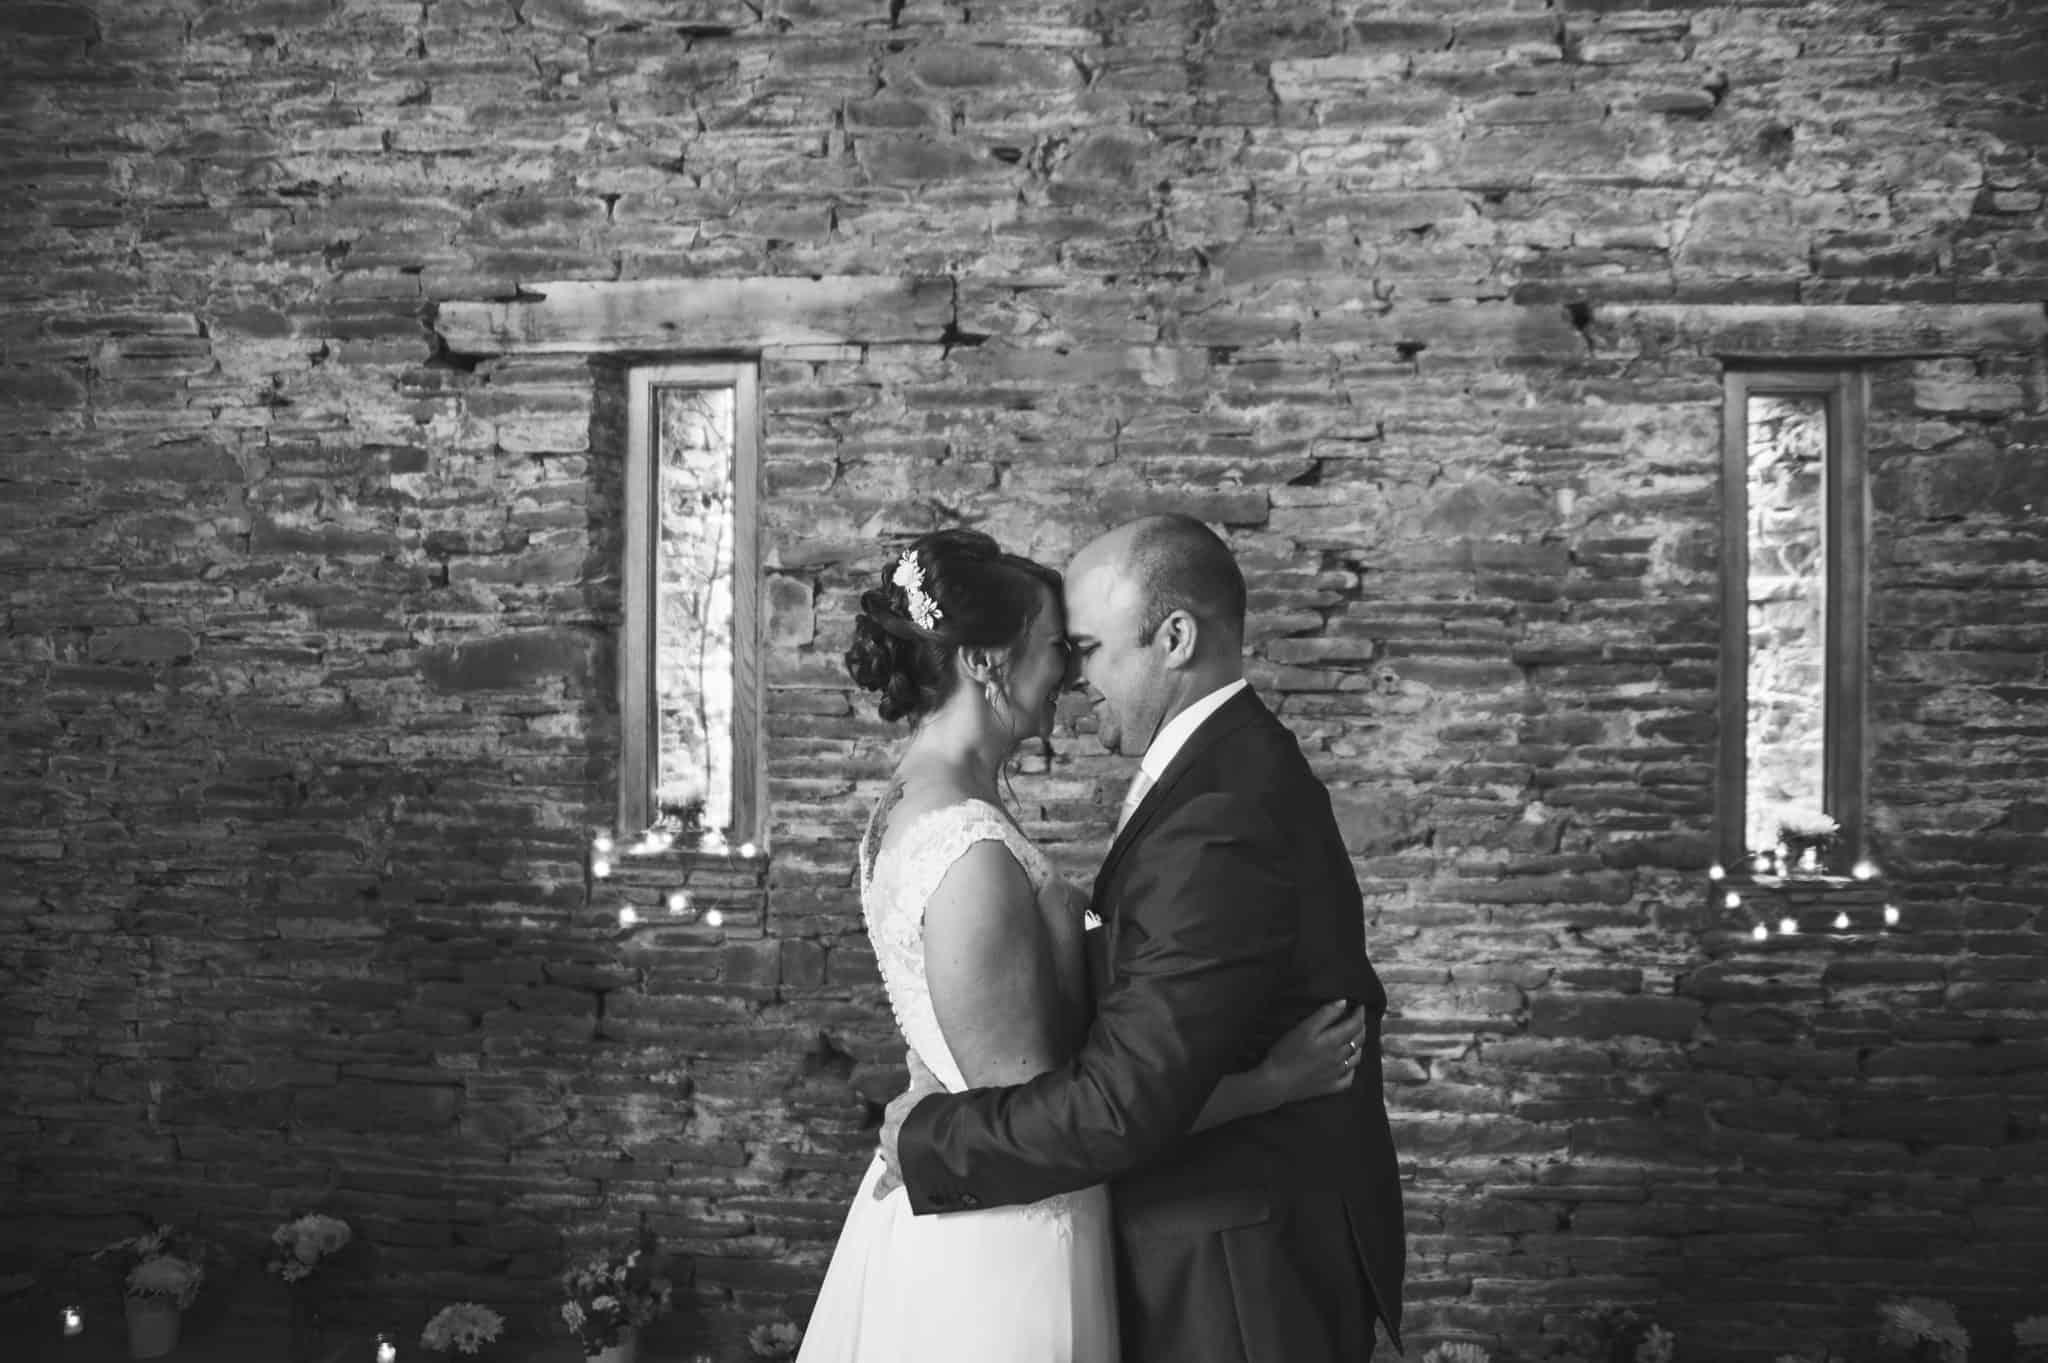 Bride & Groom embrace at a rustic barn wedding ceremony